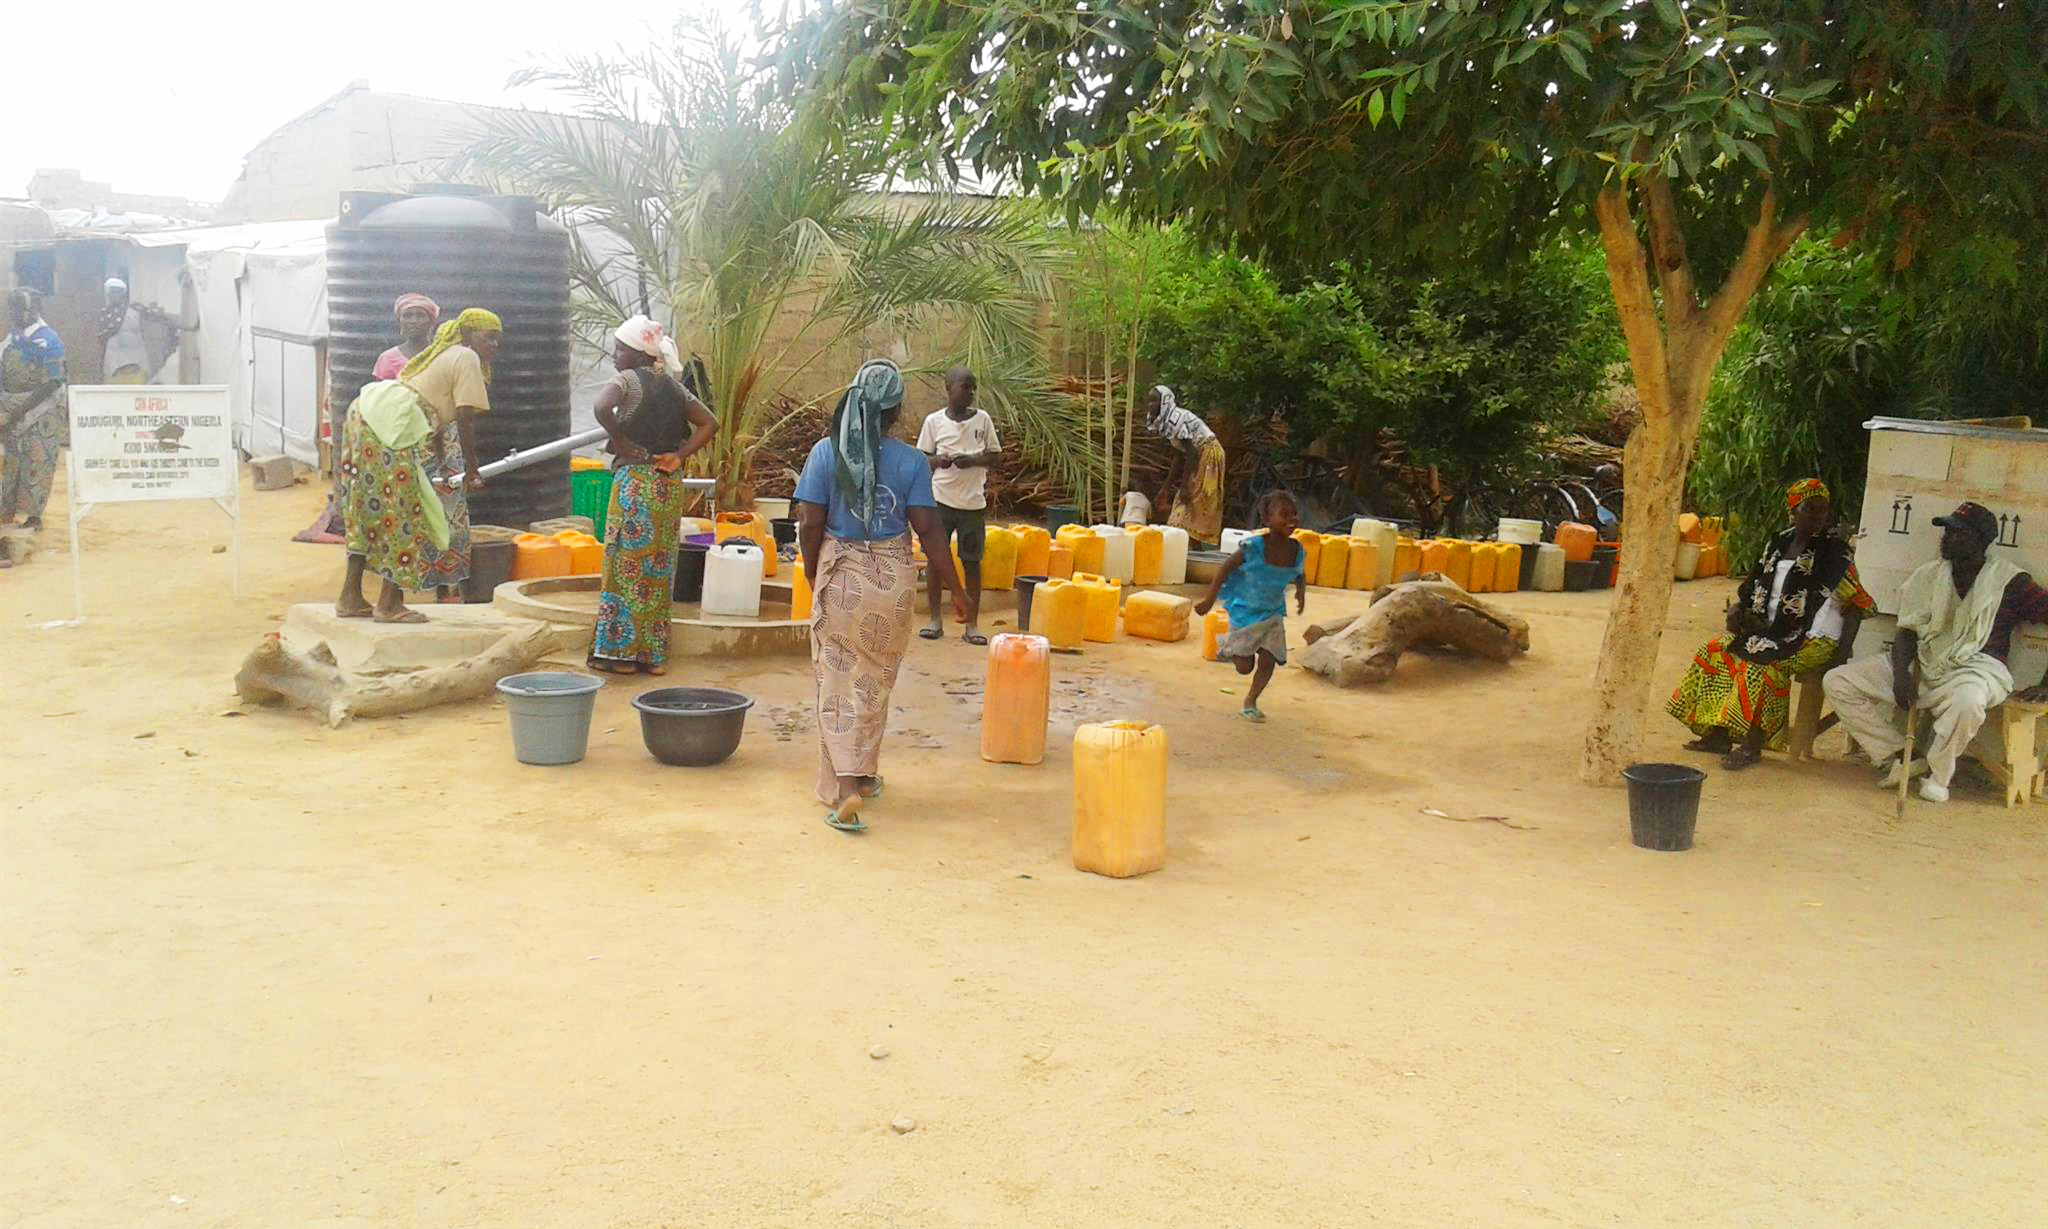 Women gathering at a water pump in Maiduguri, Nigeria ©IMPACT/2017